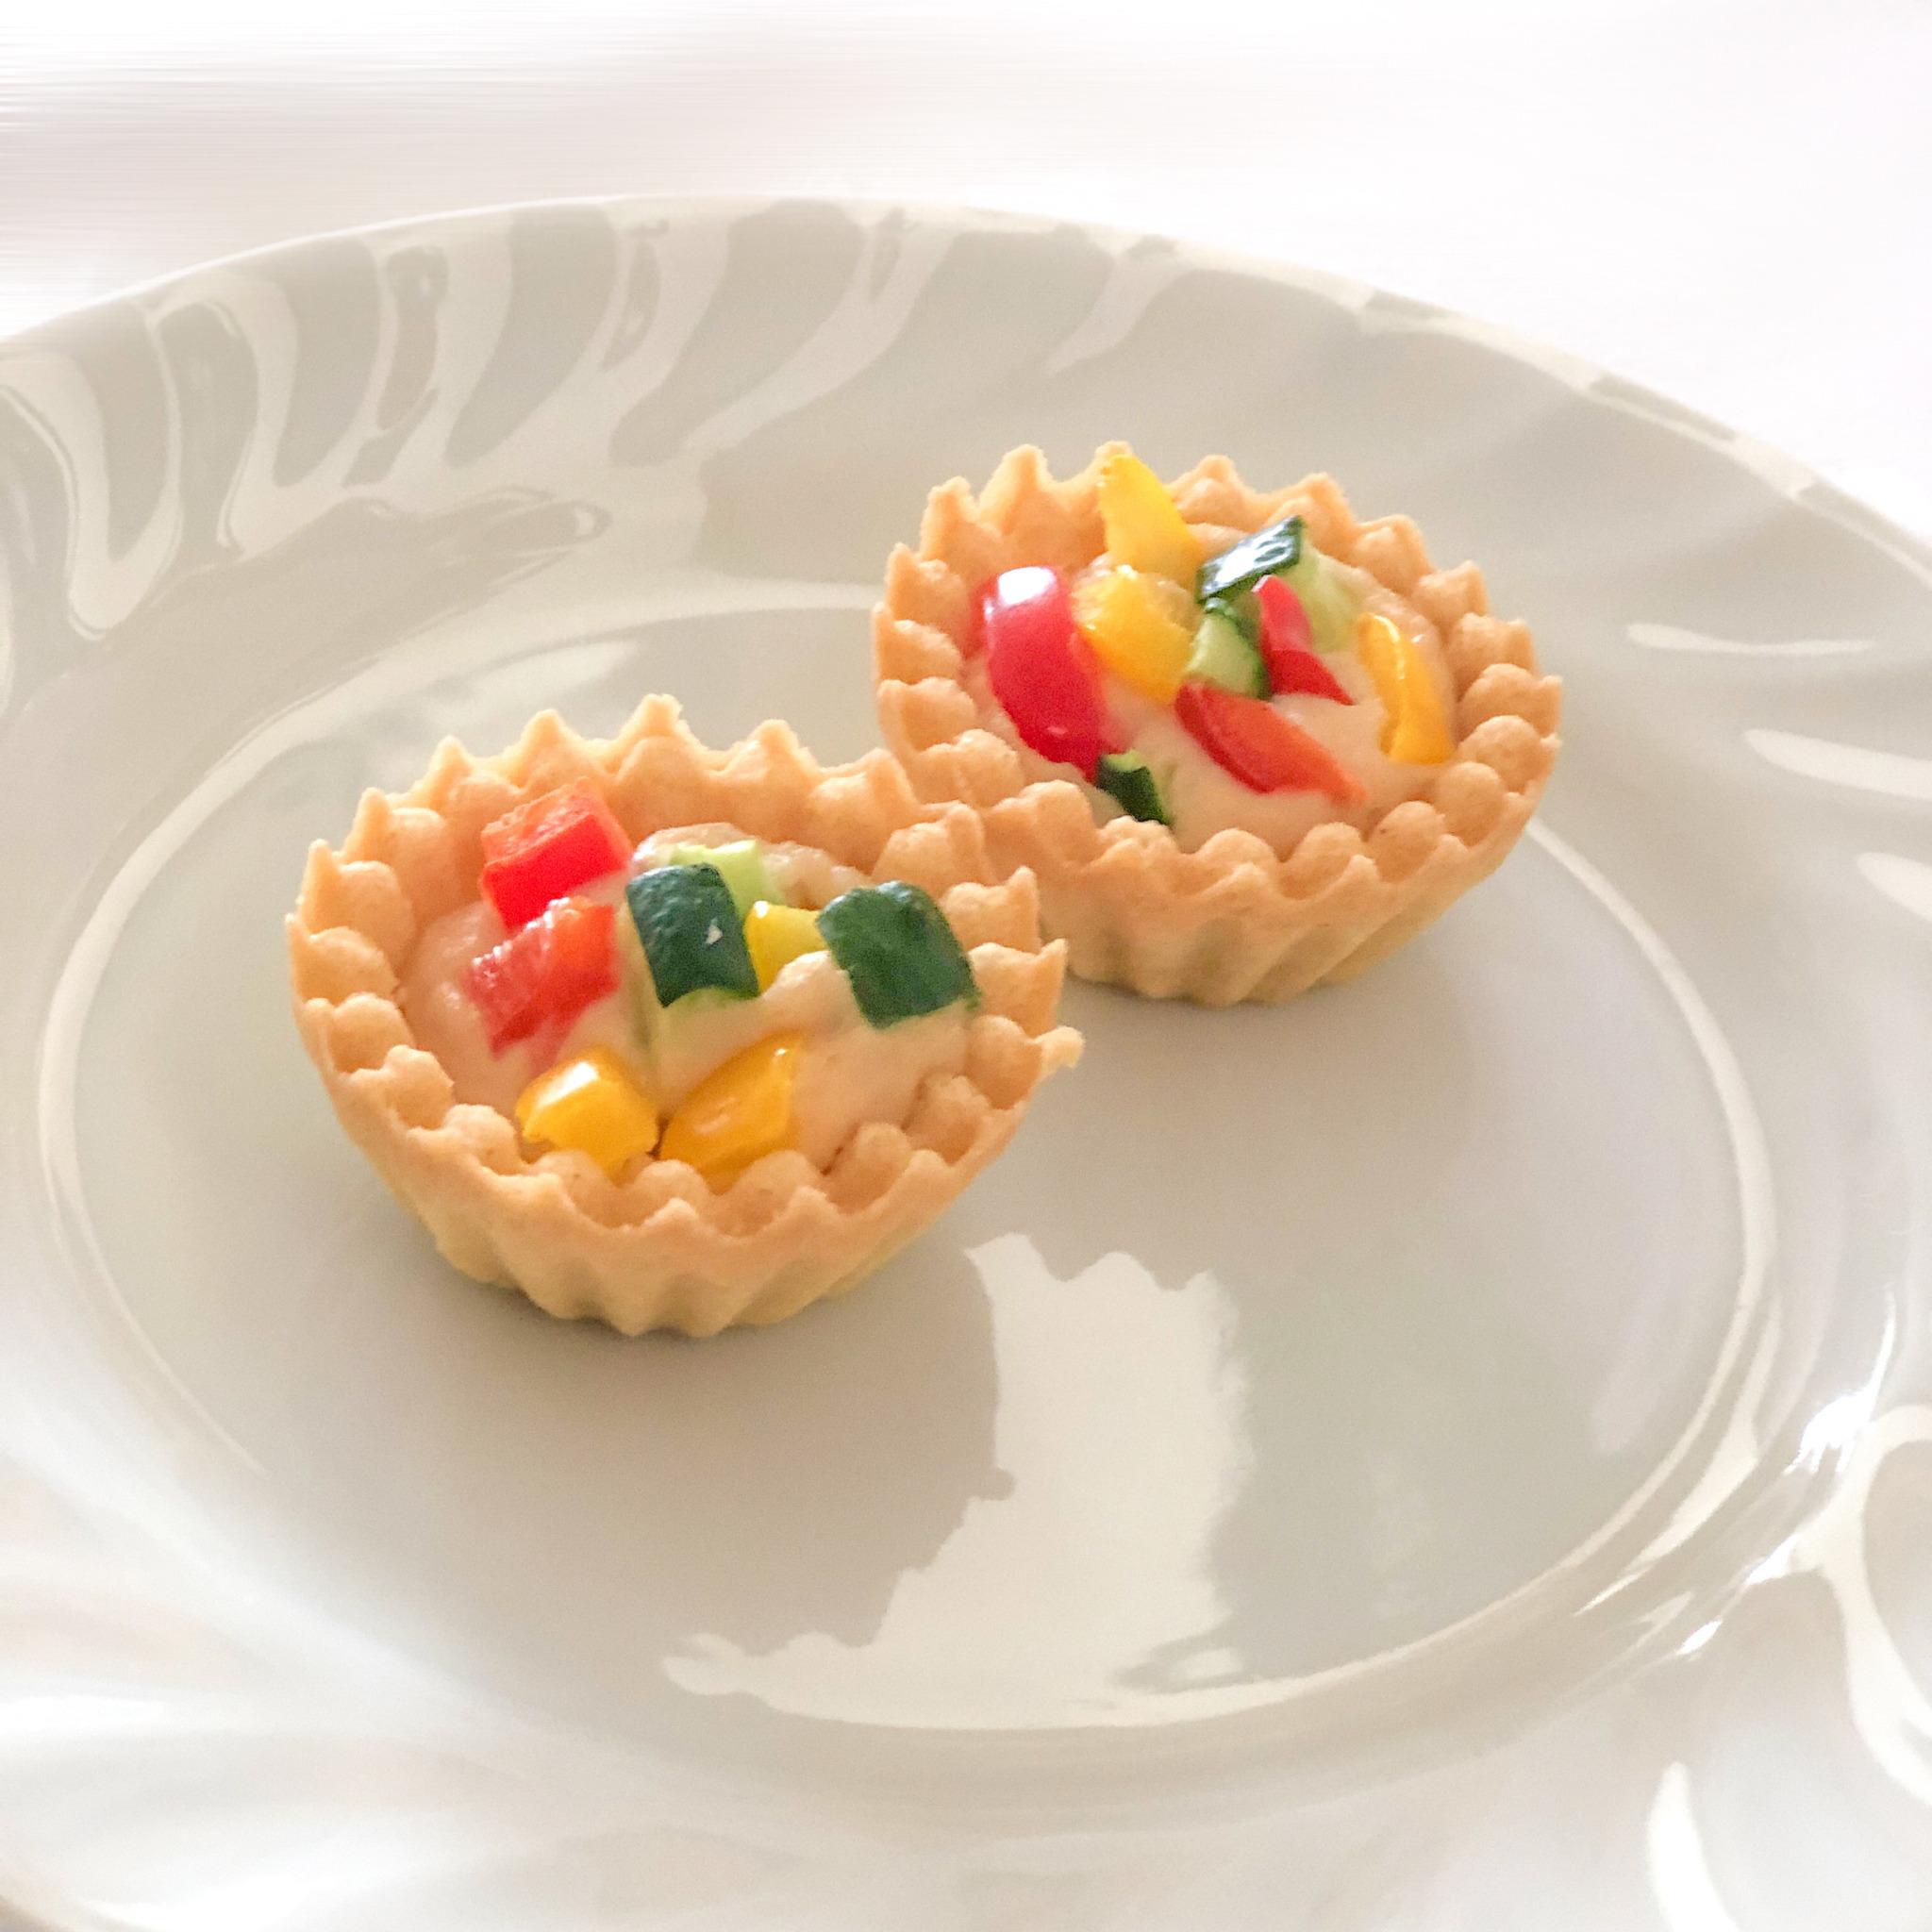 <p>自家製ディップソースと彩野菜を一口サイズのタルトに仕上げました。</p>